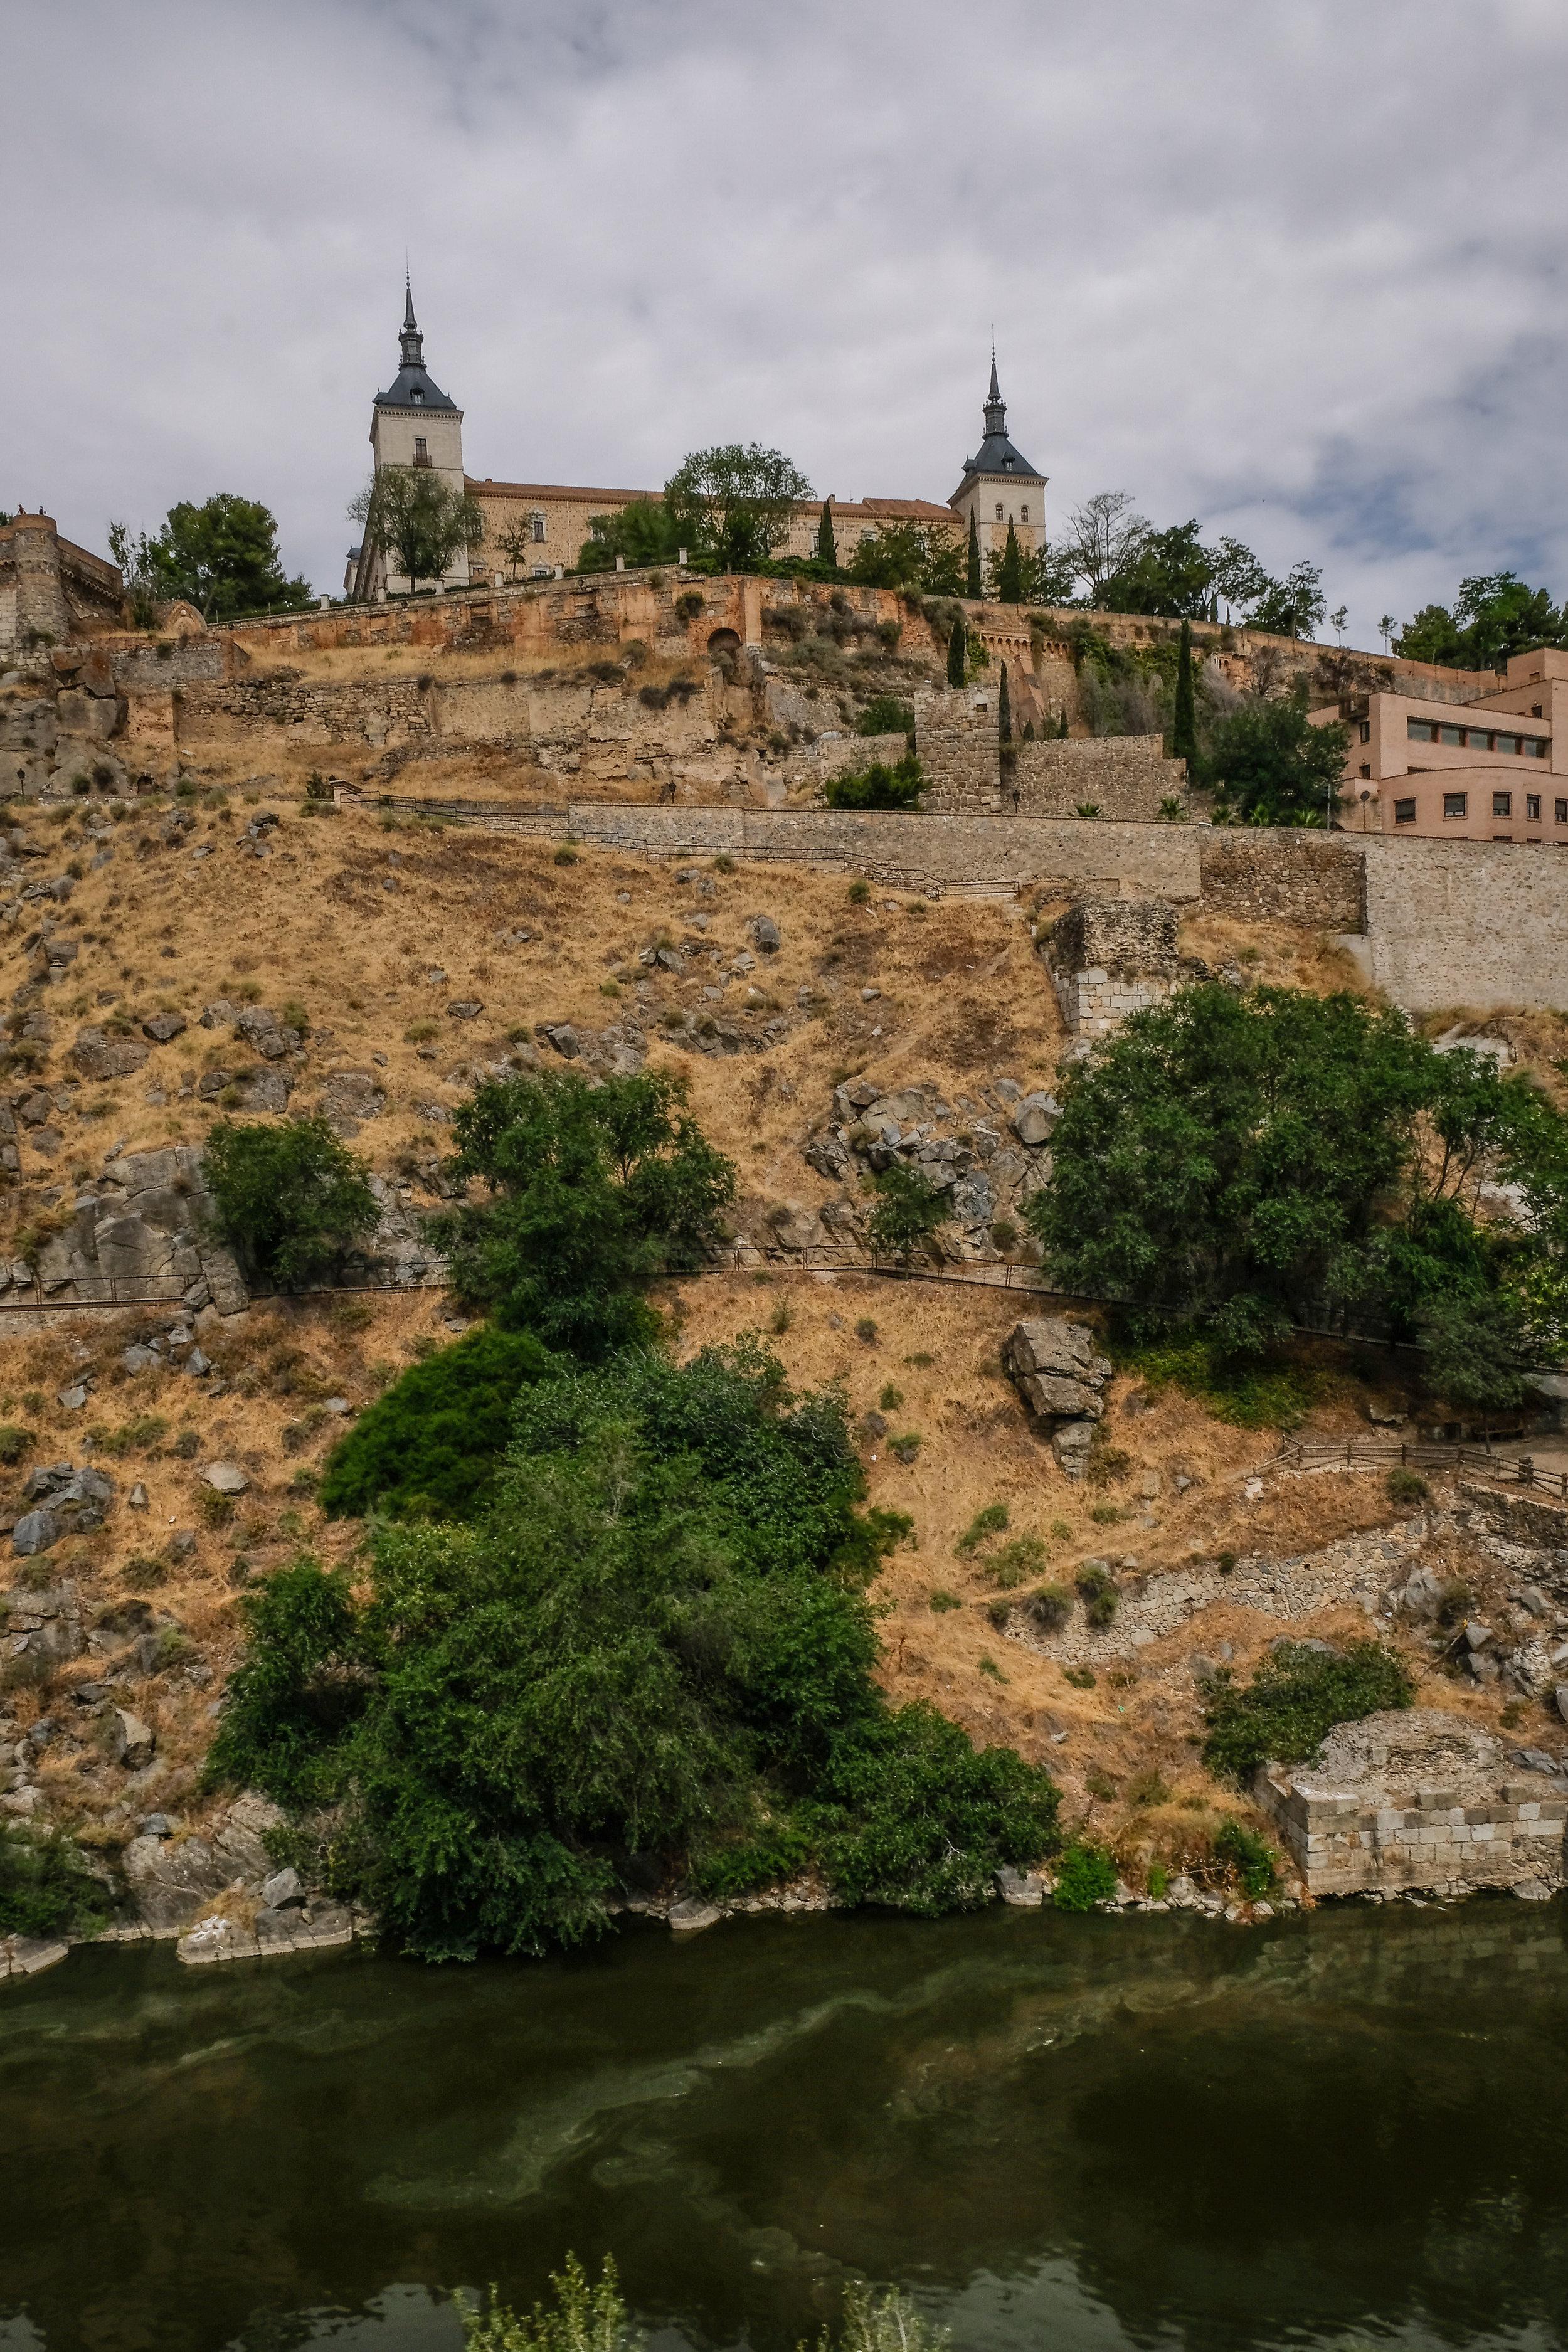 looking at Alcázar de Toledo